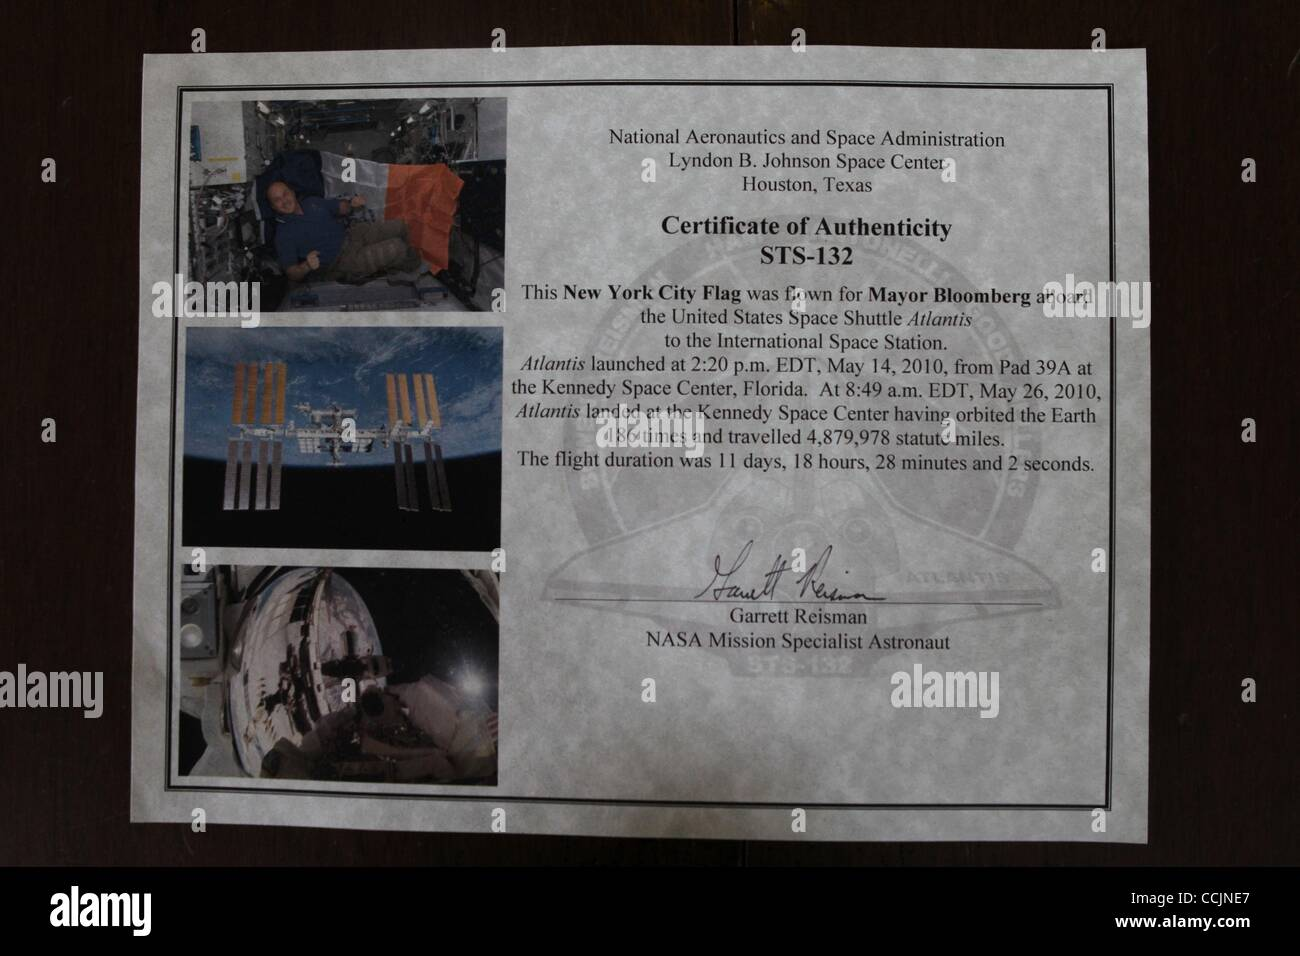 Certificate Of Authenticity Imágenes De Stock & Certificate Of ...